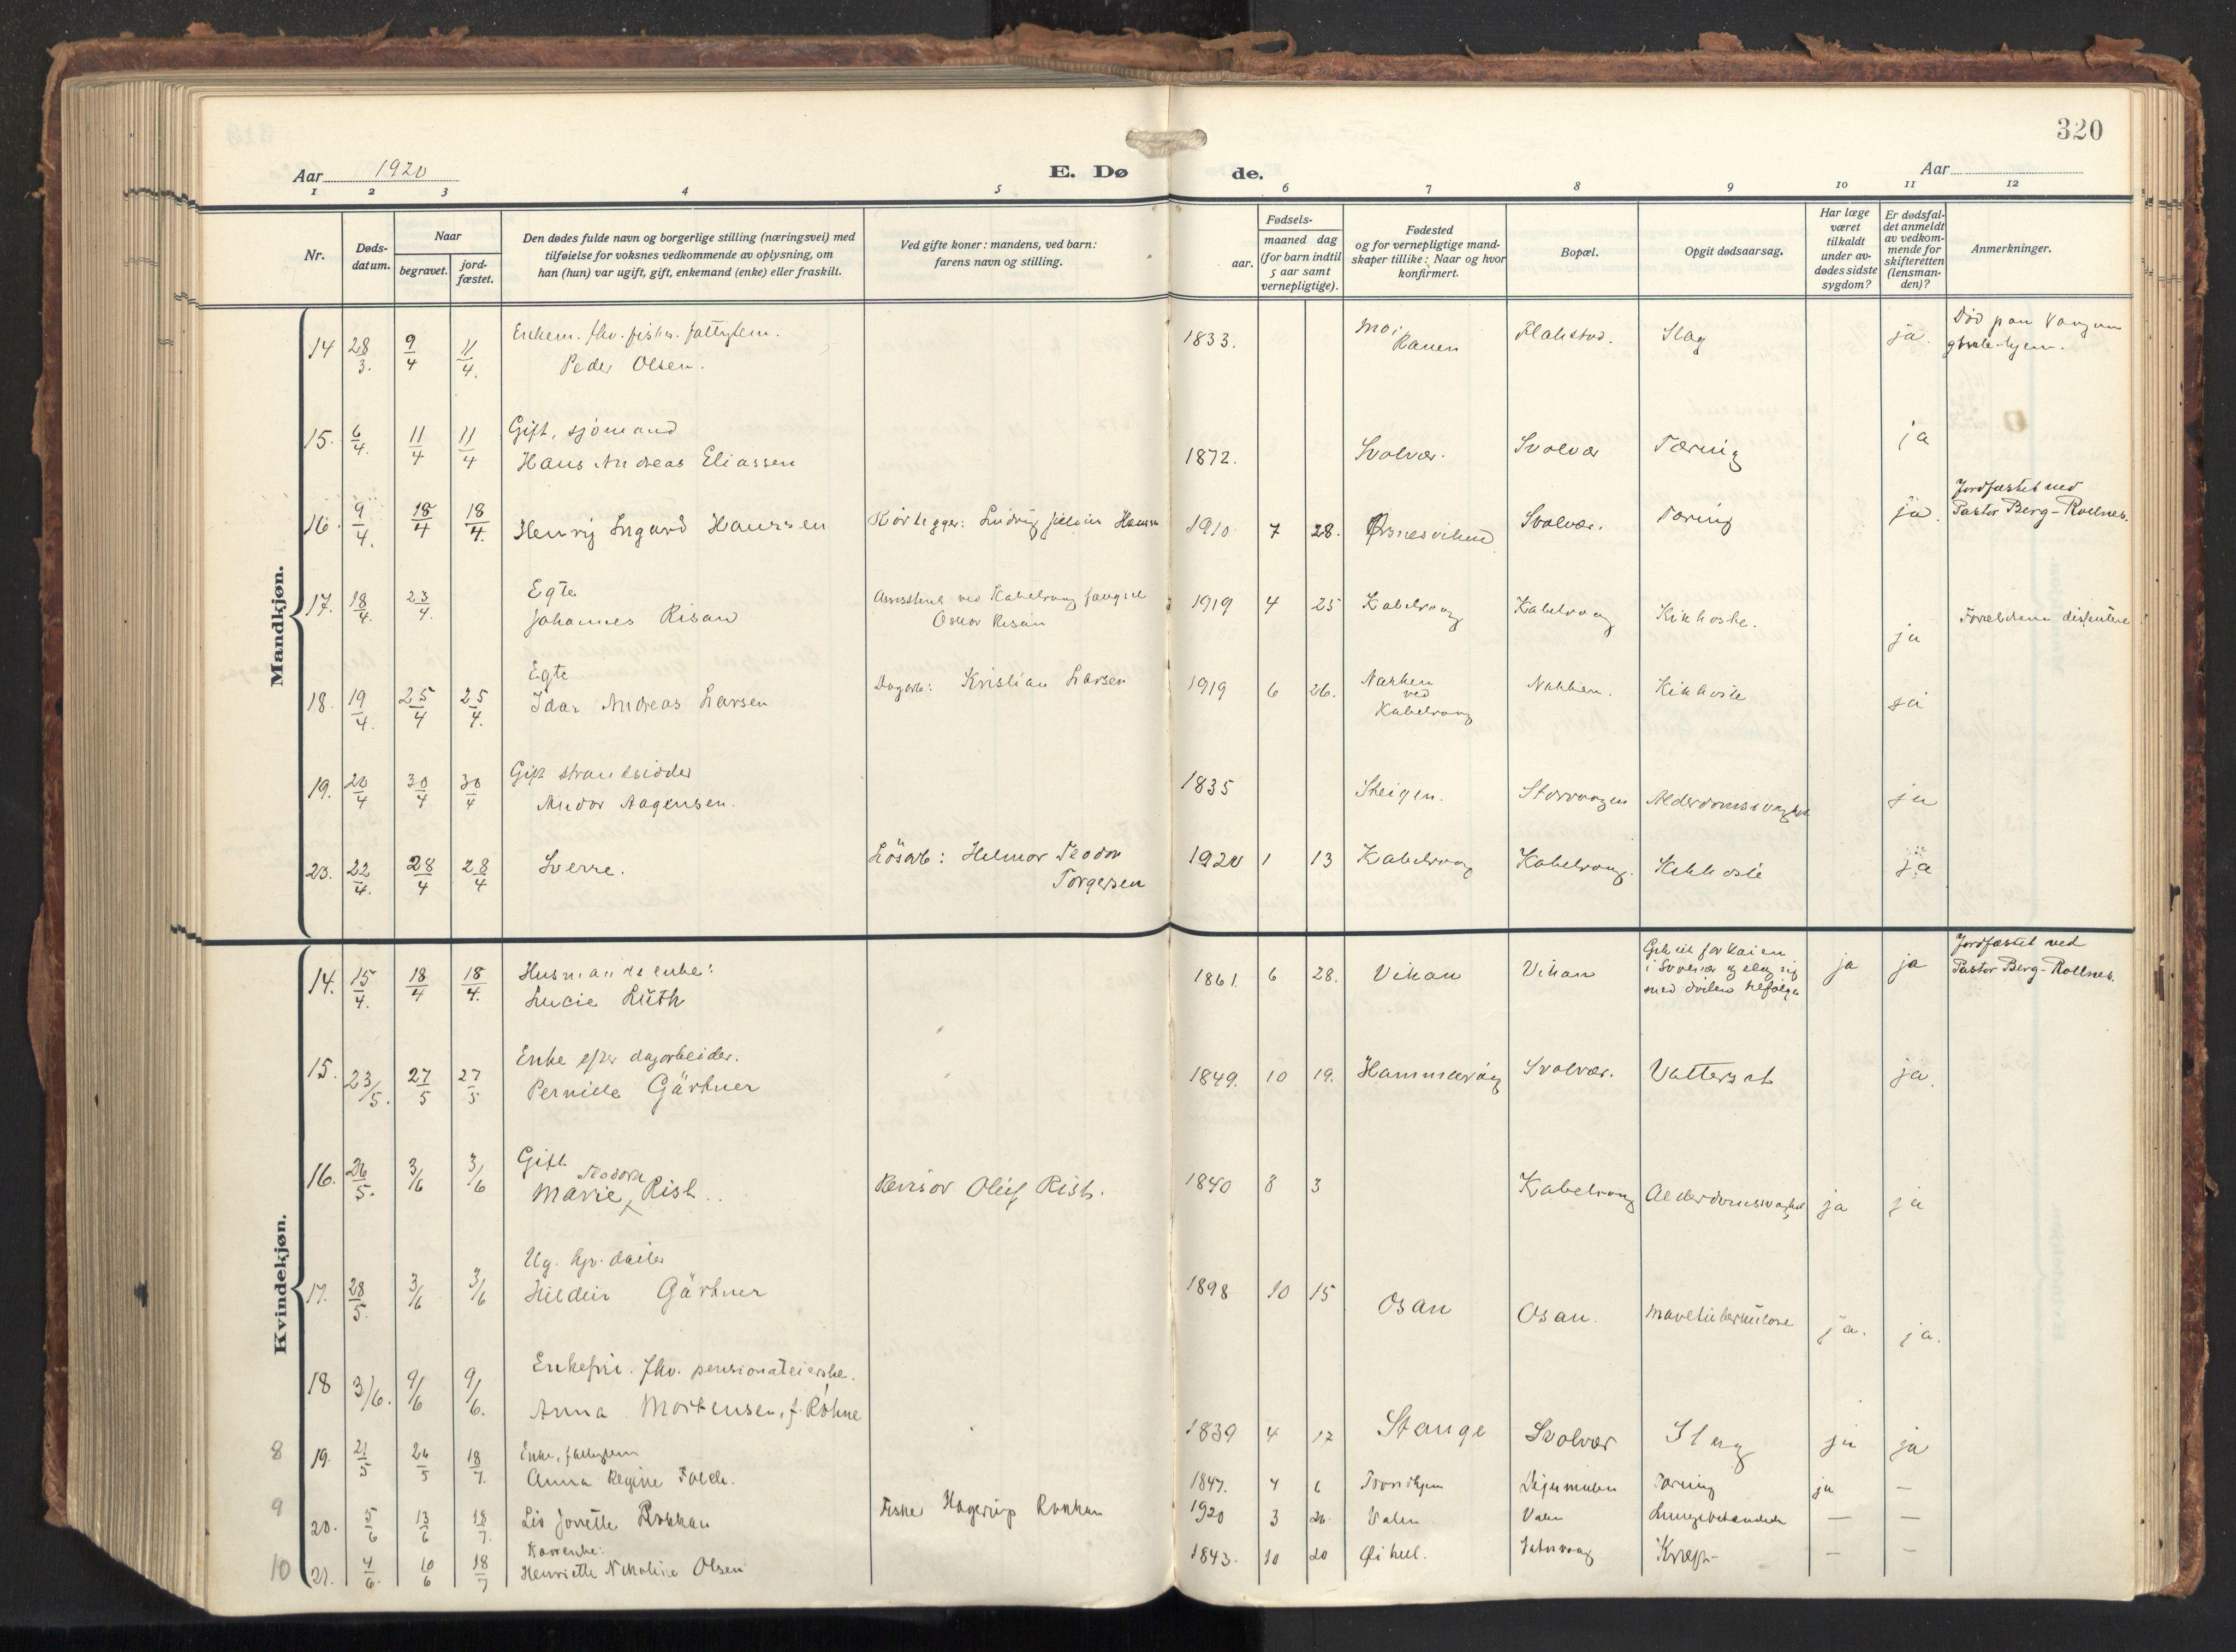 SAT, Ministerialprotokoller, klokkerbøker og fødselsregistre - Nordland, 874/L1064: Ministerialbok nr. 874A08, 1915-1926, s. 320